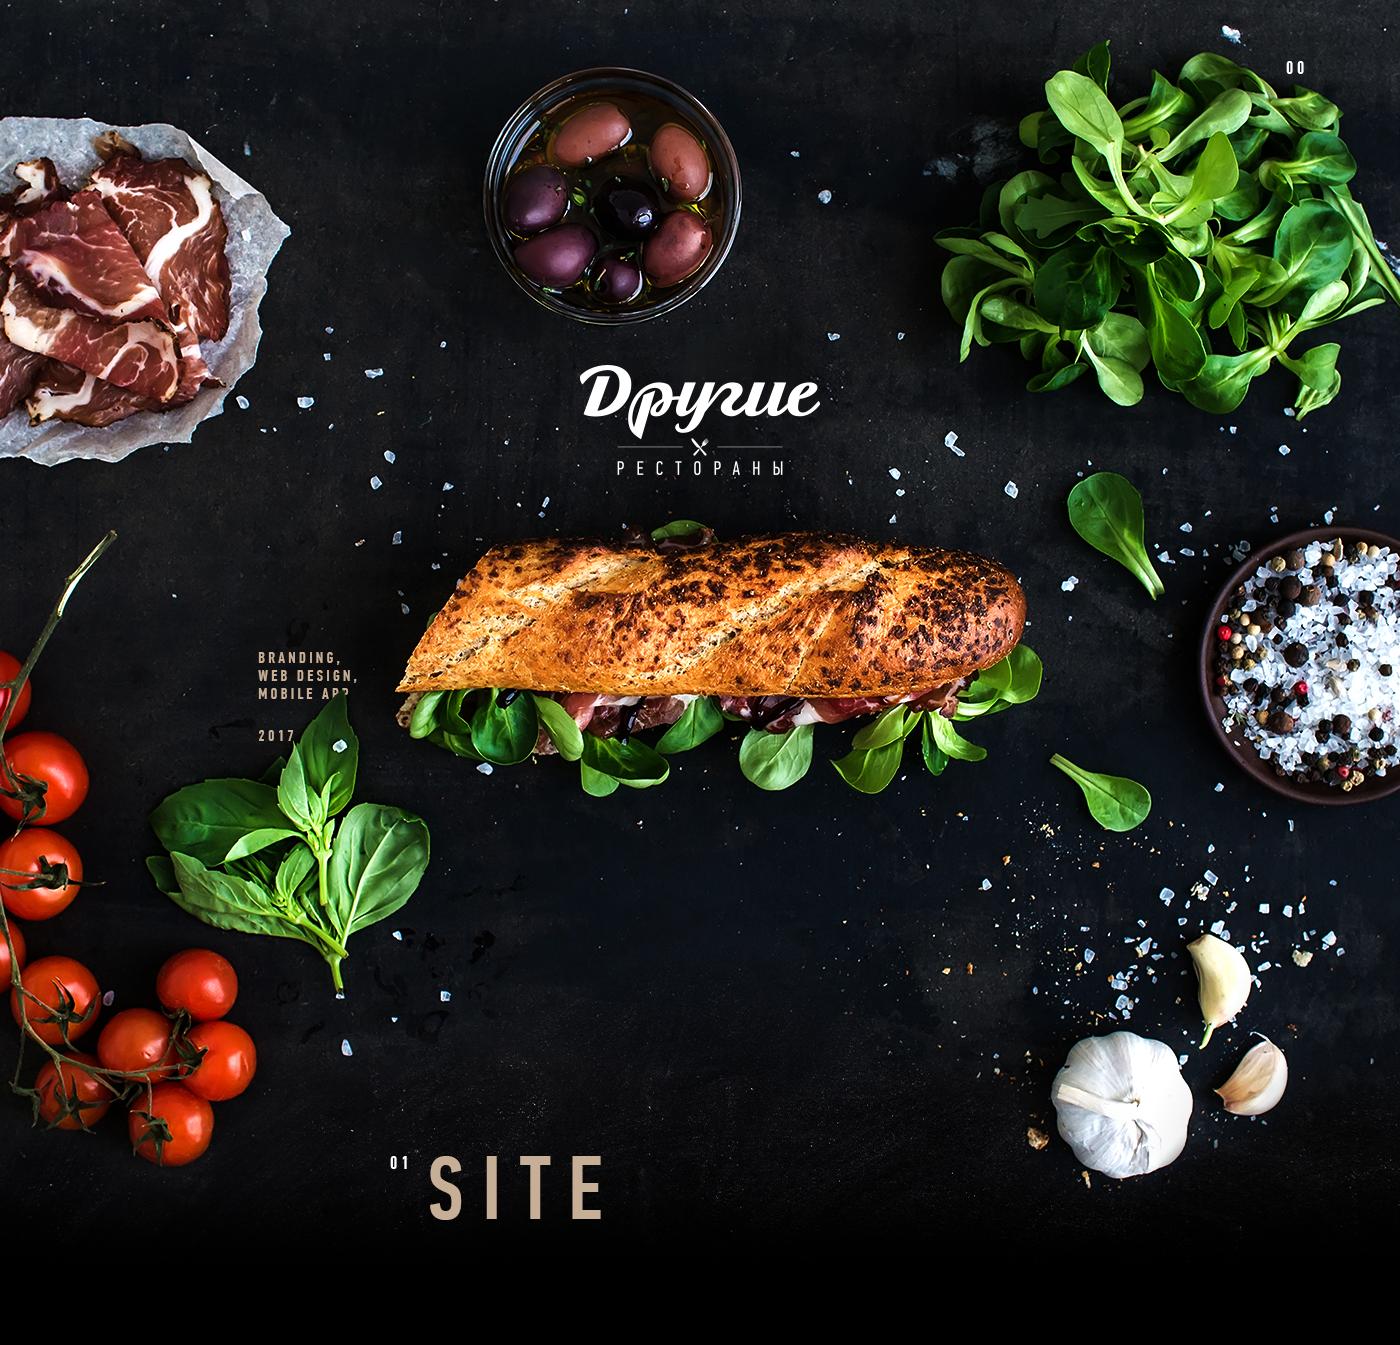 Quot Drygie Restaurants Quot Its 4 Restaurants Based In Ulyanovsk Russia Download The Appios Https X2f X2f Itunes Apple Com X2f Ru X2f Ap 디자인